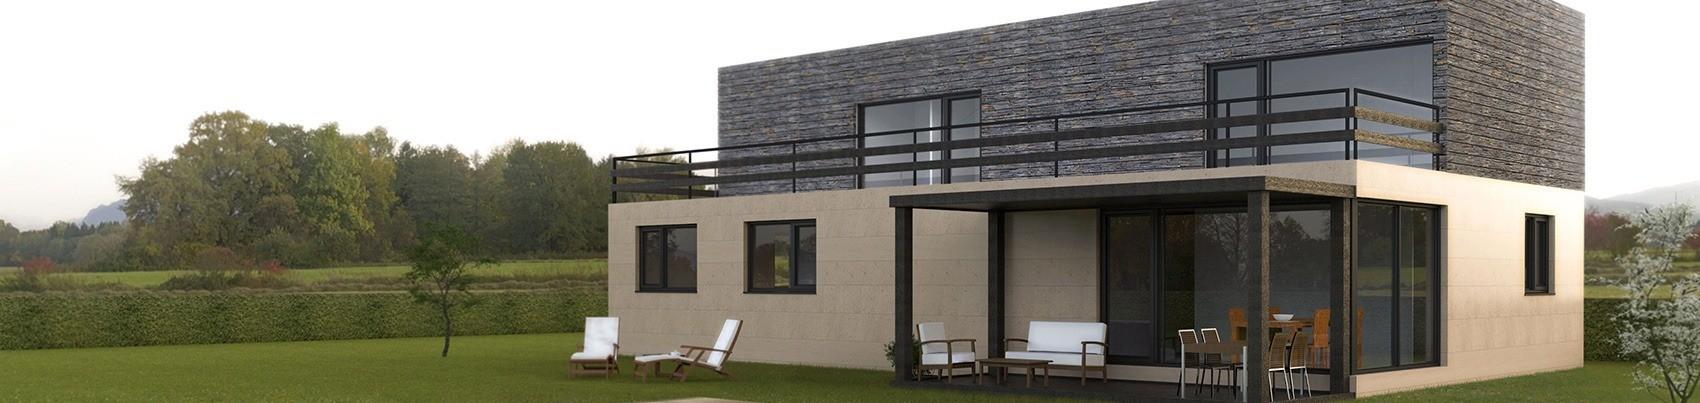 Casas prefabricadas y modulares cube for Construccion modular prefabricada